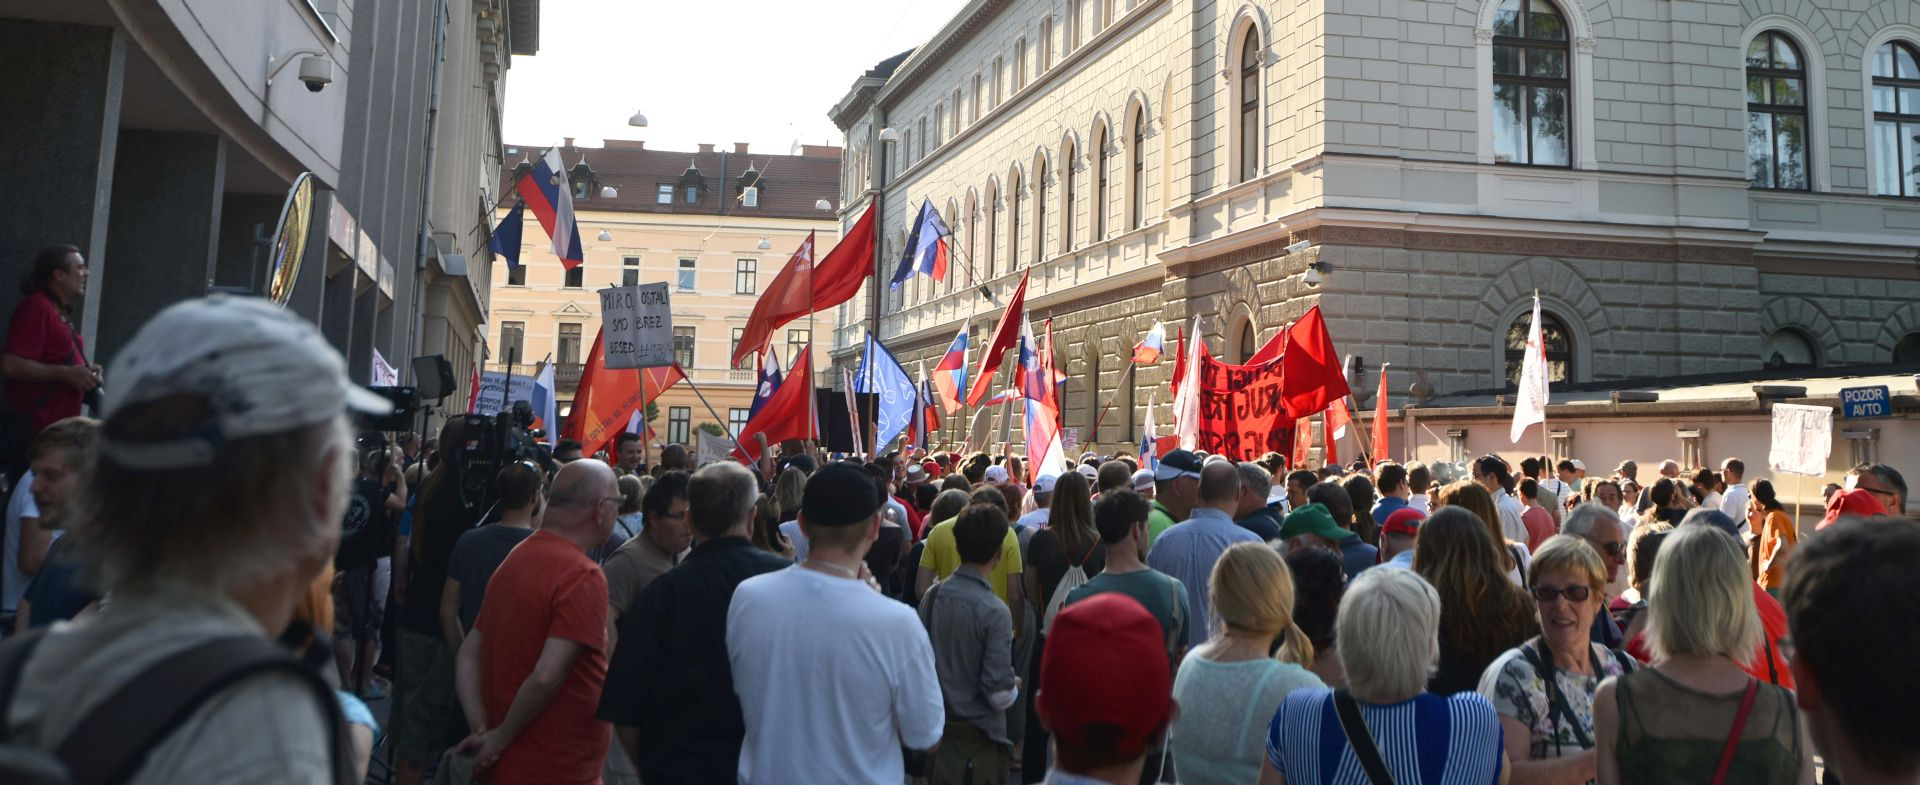 Prosvjedi pred slovenskom vladom zbog navodne privatizacije luke Koper